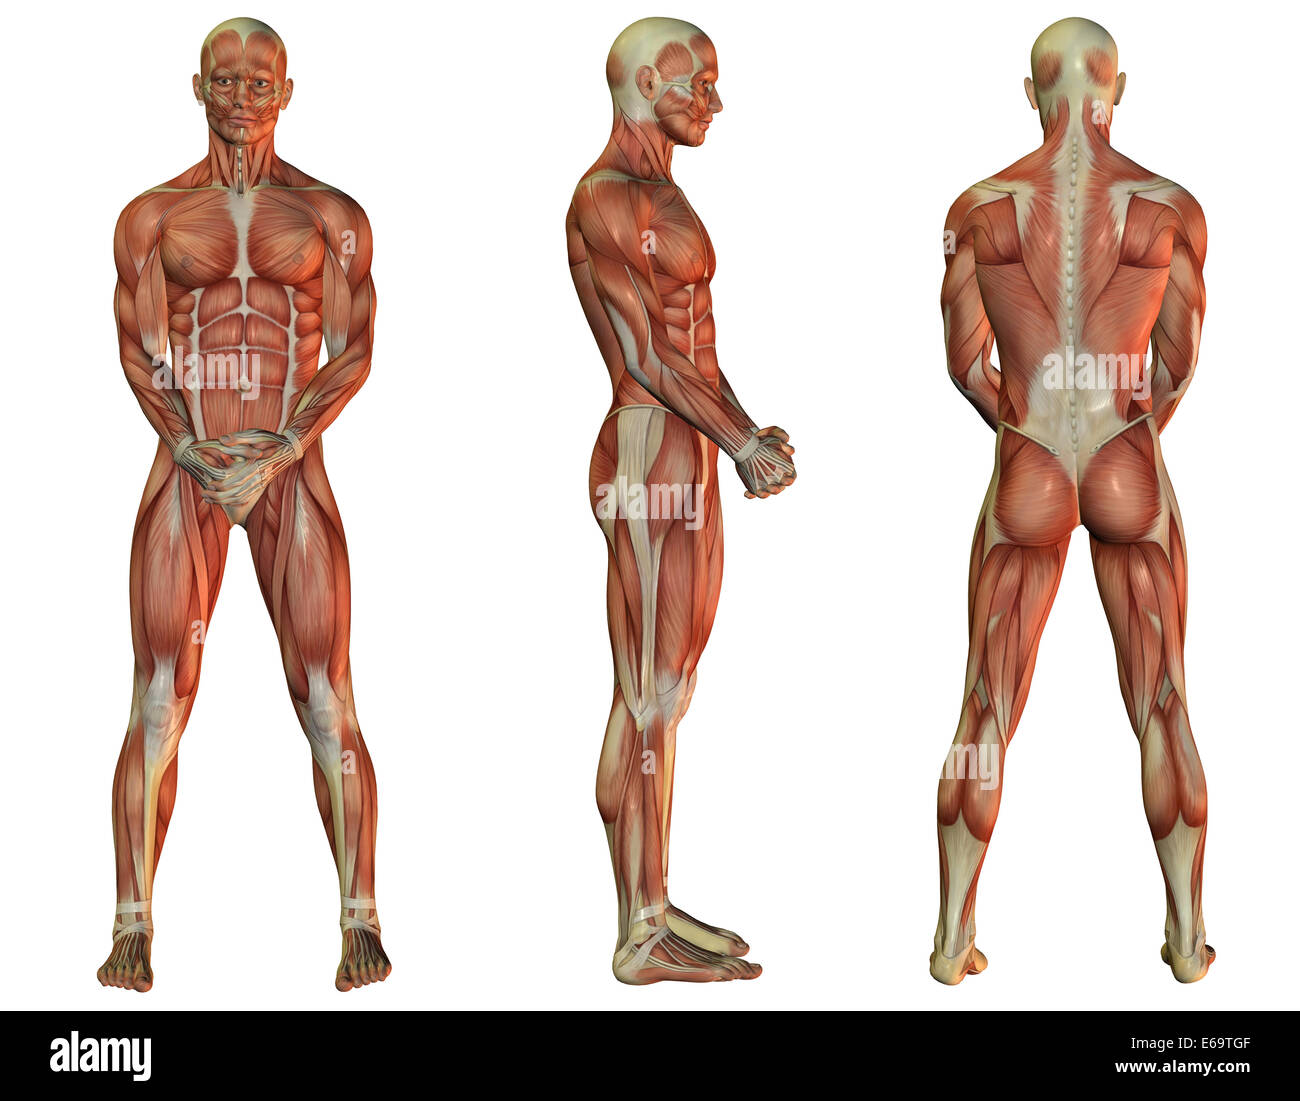 Anatomie, Muskulatur, Muskeln, Menschen Stockfoto, Bild: 72746255 ...